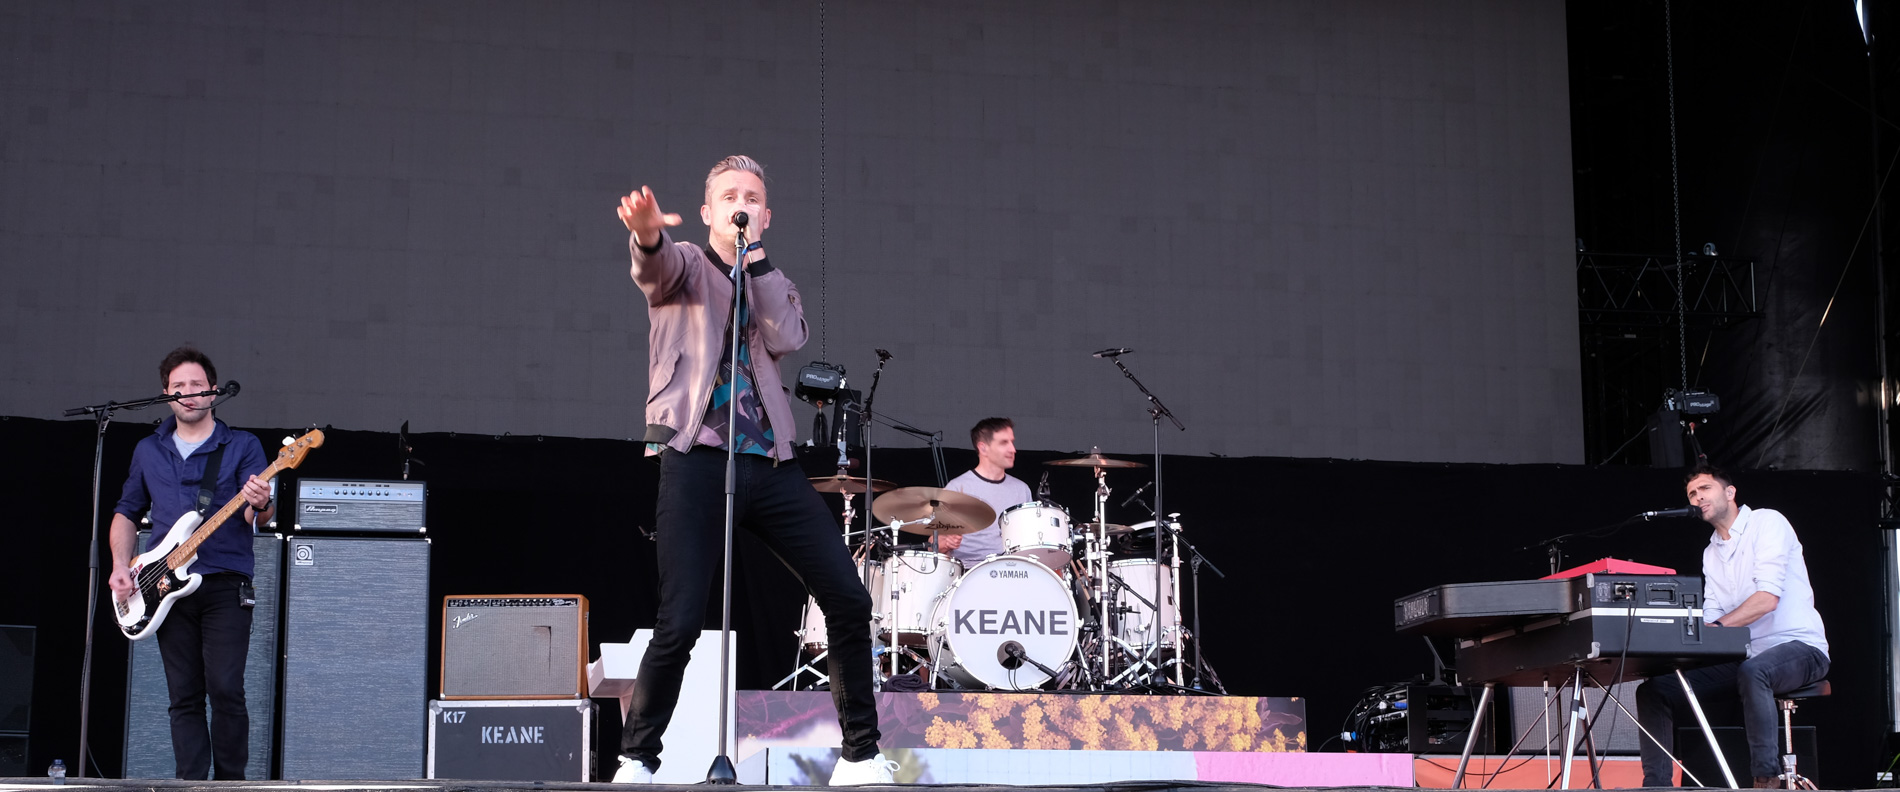 Anmeldelse NS19: Thumbs up til Keane, der genopstod i Aarhus